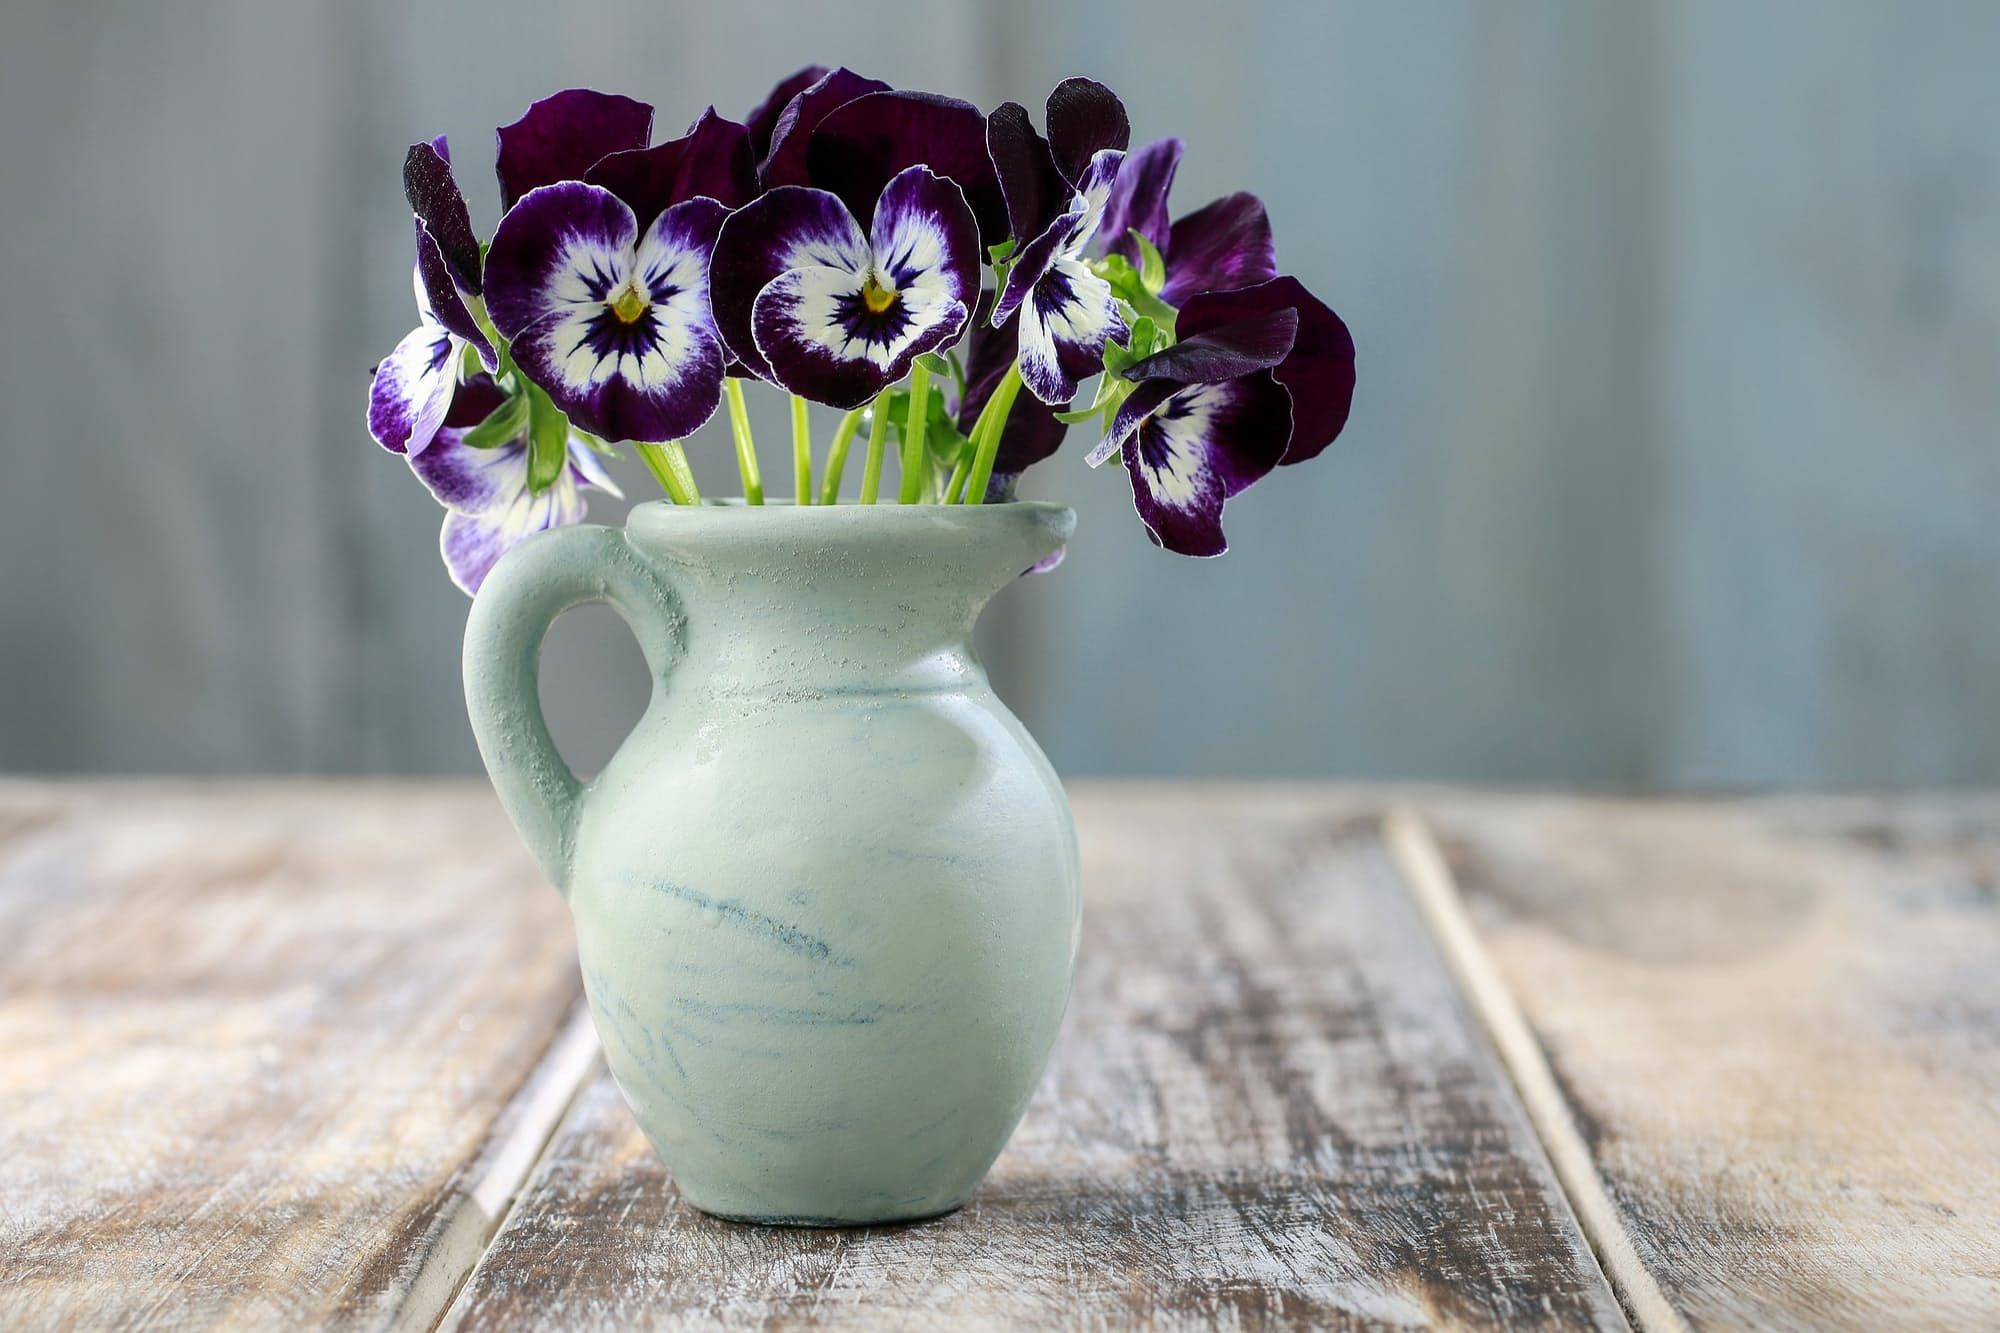 Stay in season the most beautiful winter flowers for your home stay in season the most beautiful winter flowers for your home izmirmasajfo